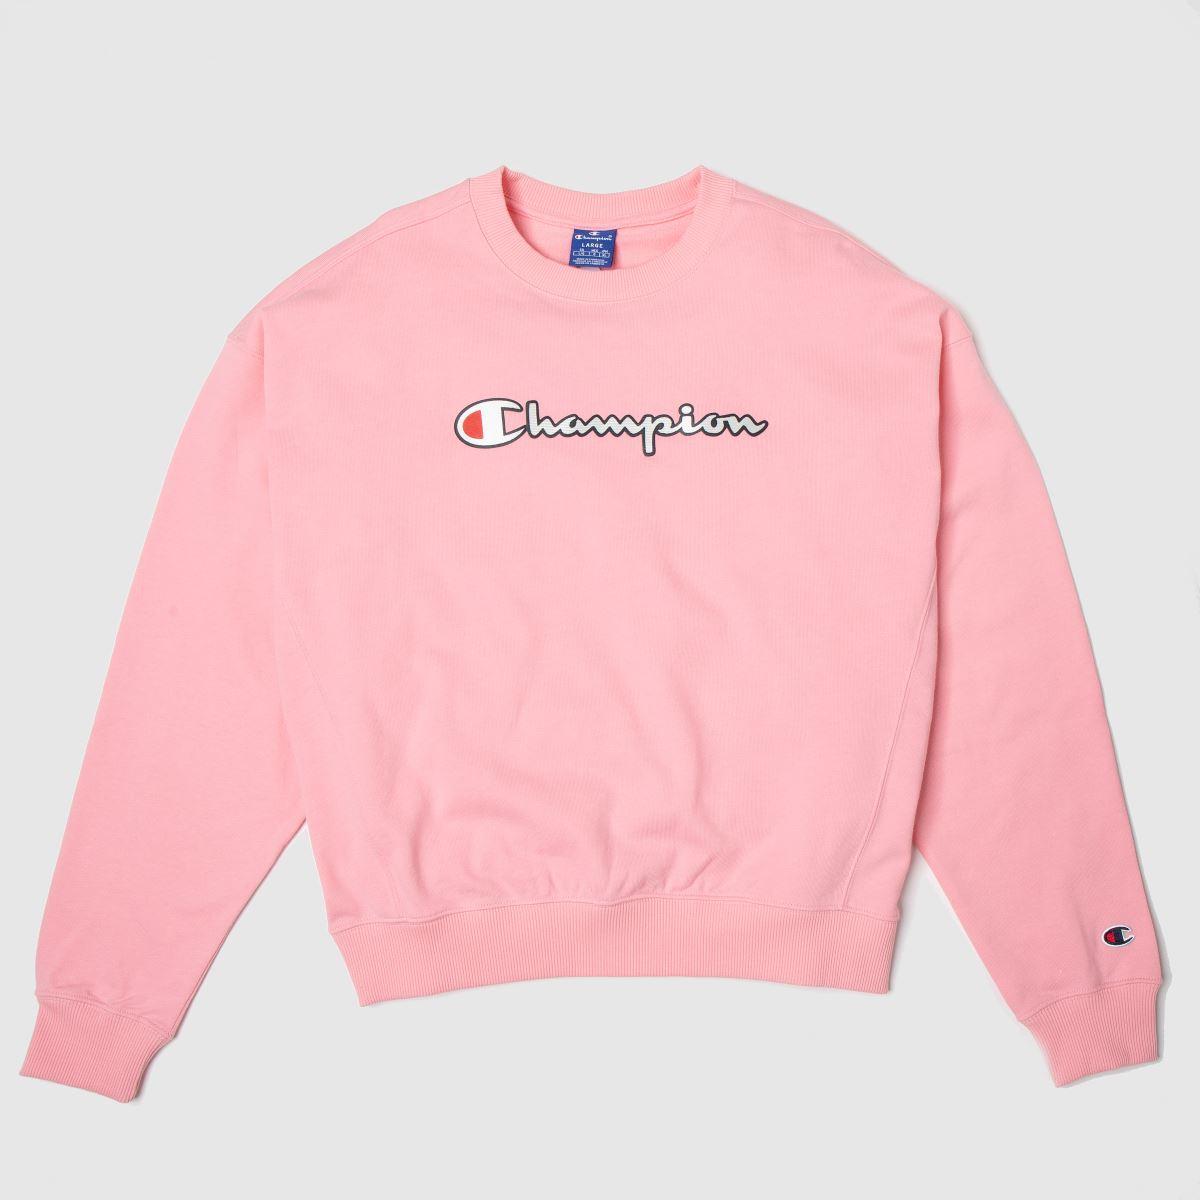 Champion Clothing Champion Pink Crewneck Sweatshirt